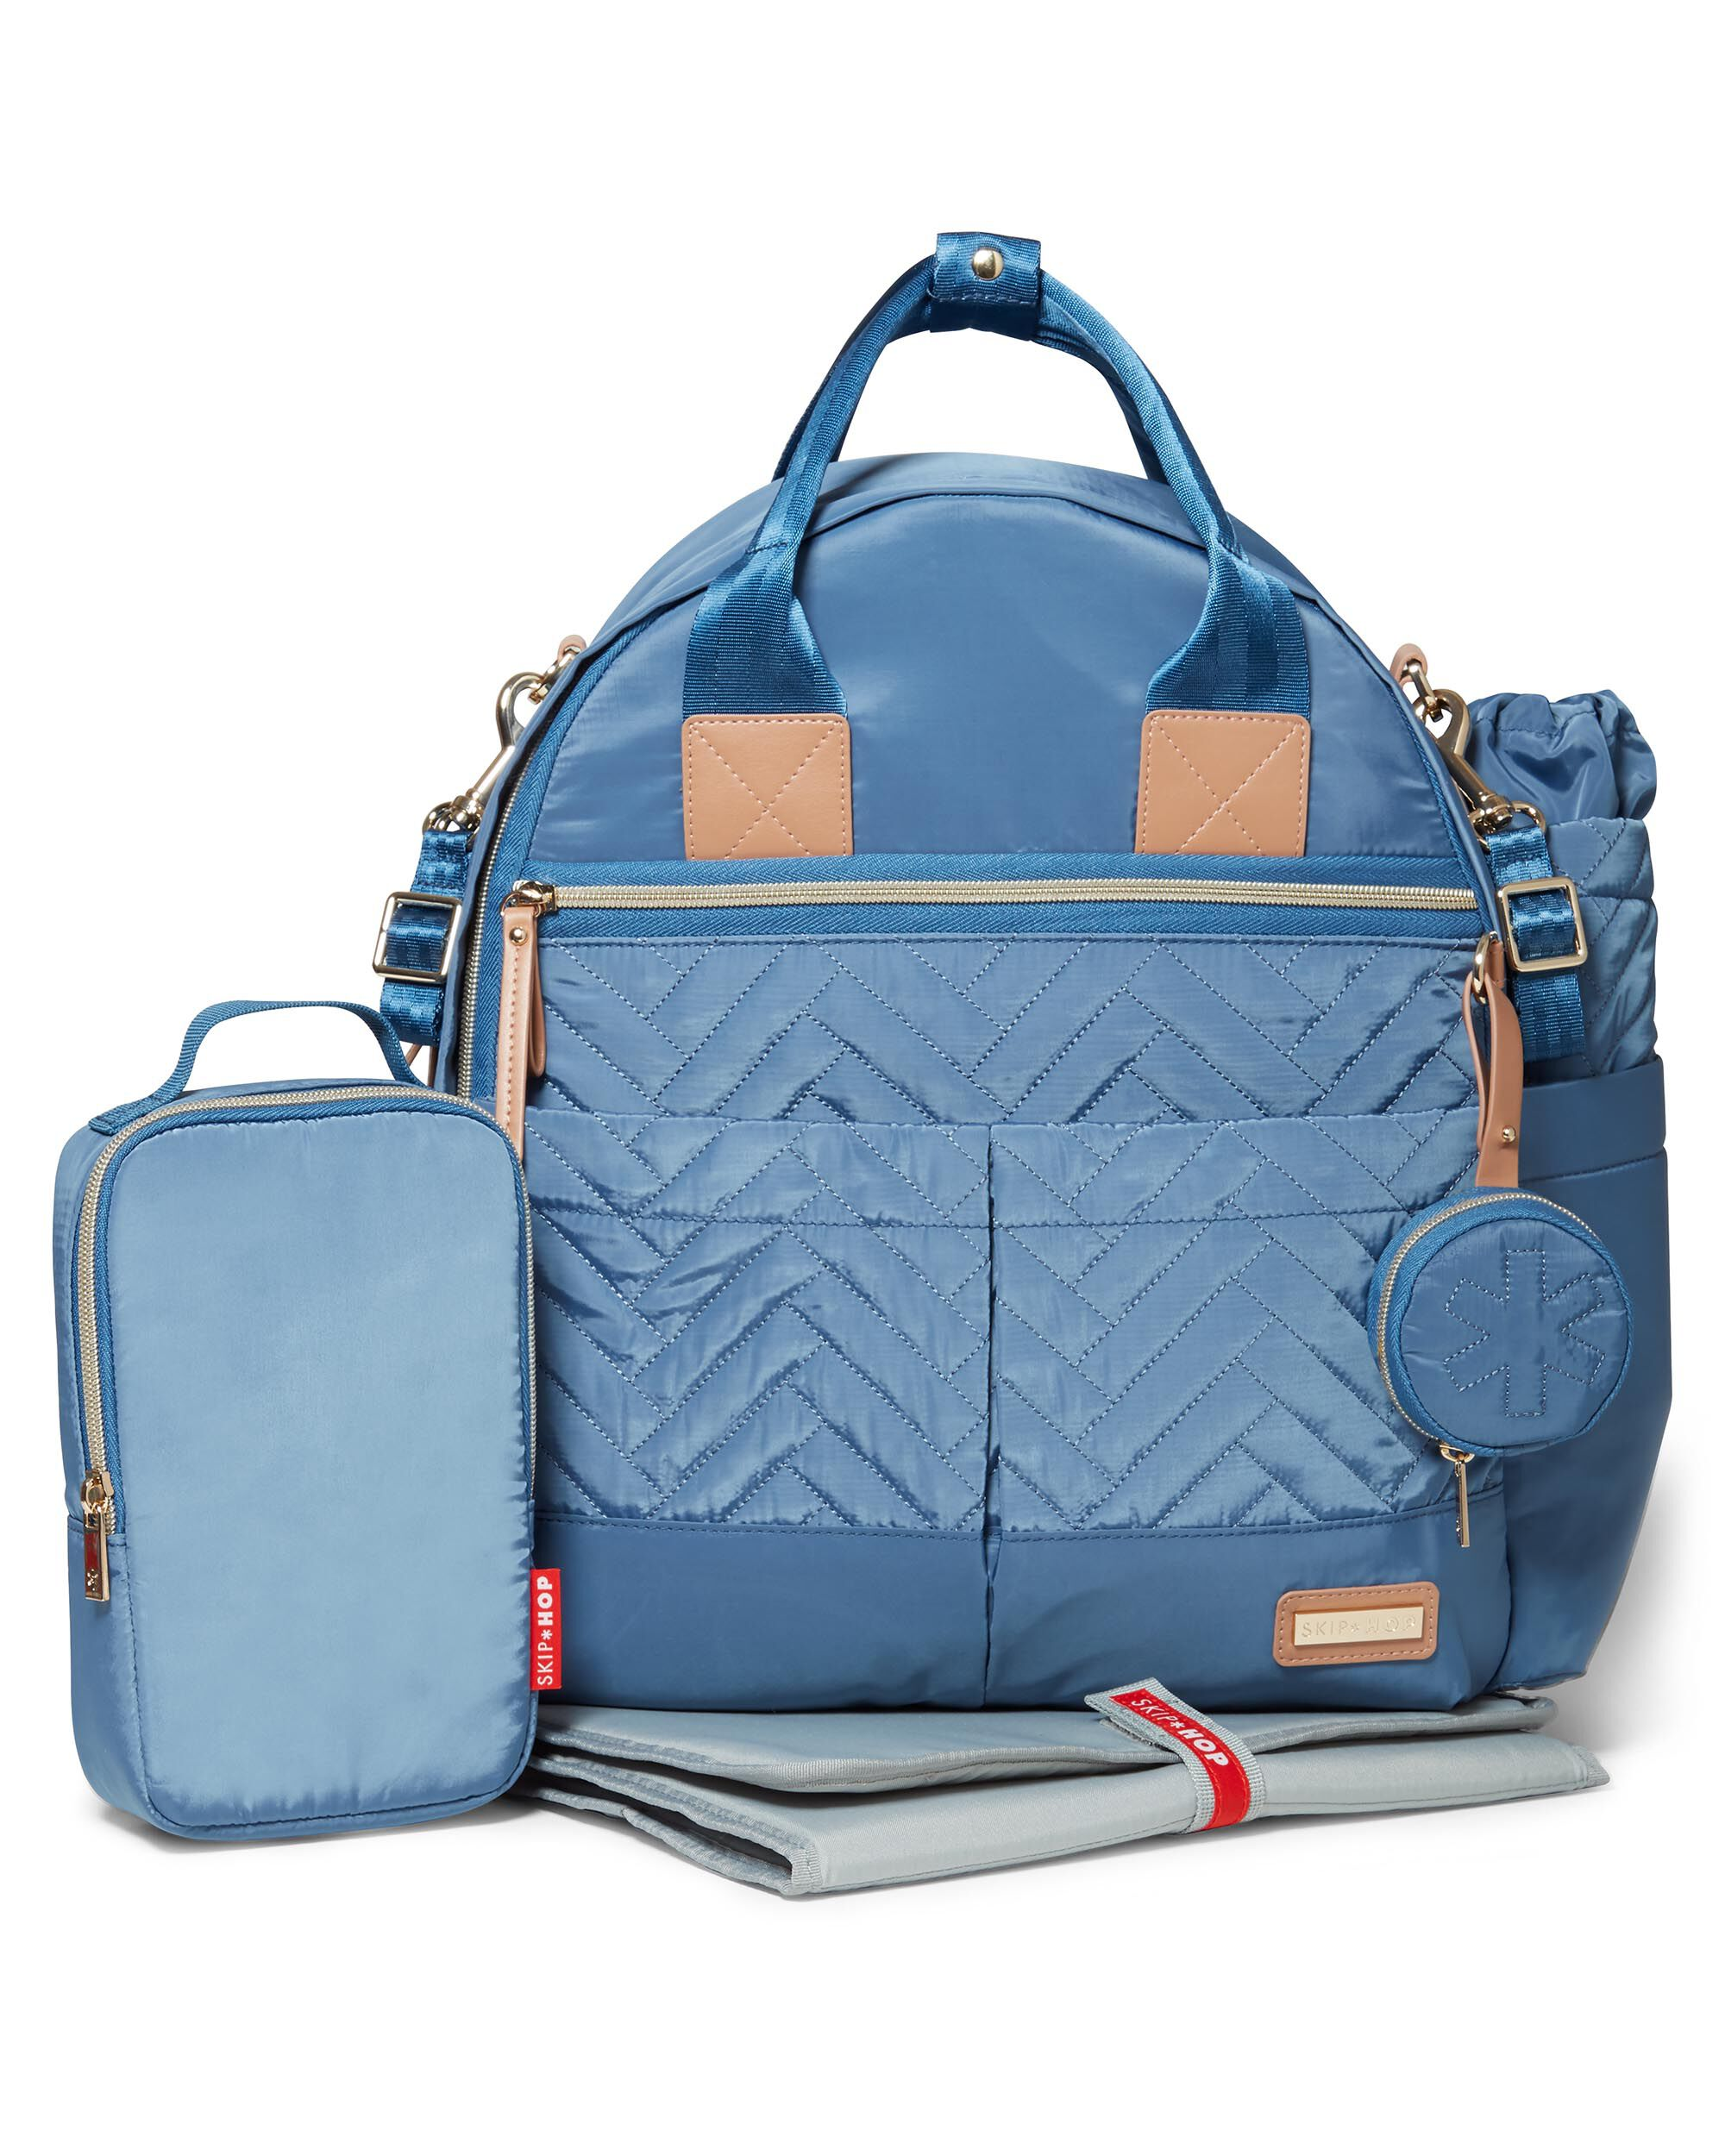 Suite By Skip Hop 6 In 1 Diaper Backpack Set